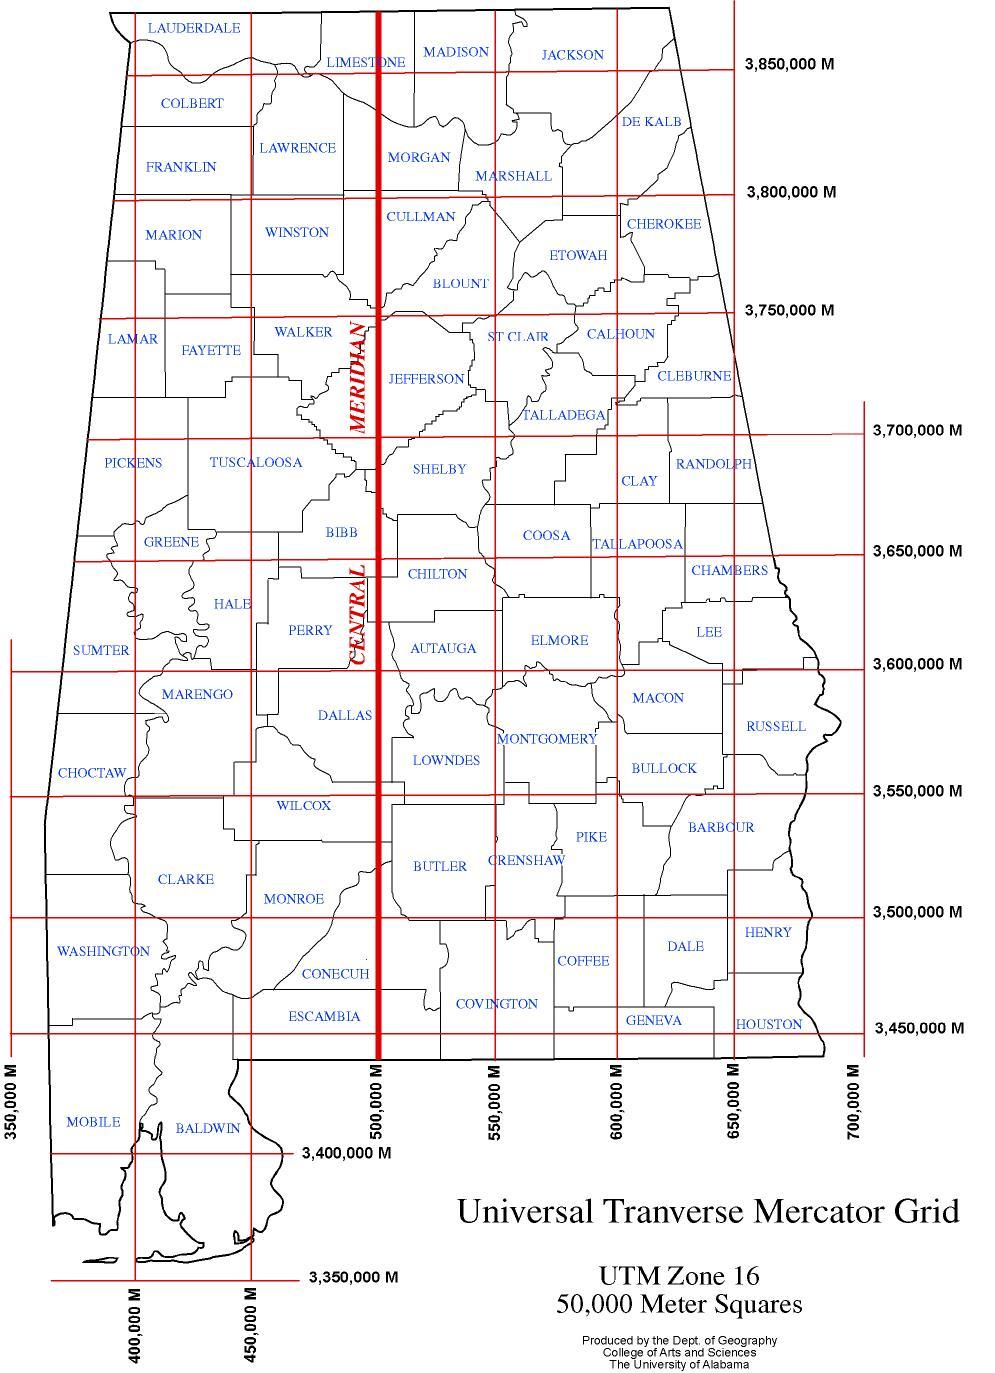 Alabama maps basemaps universal transverse ccuart Gallery